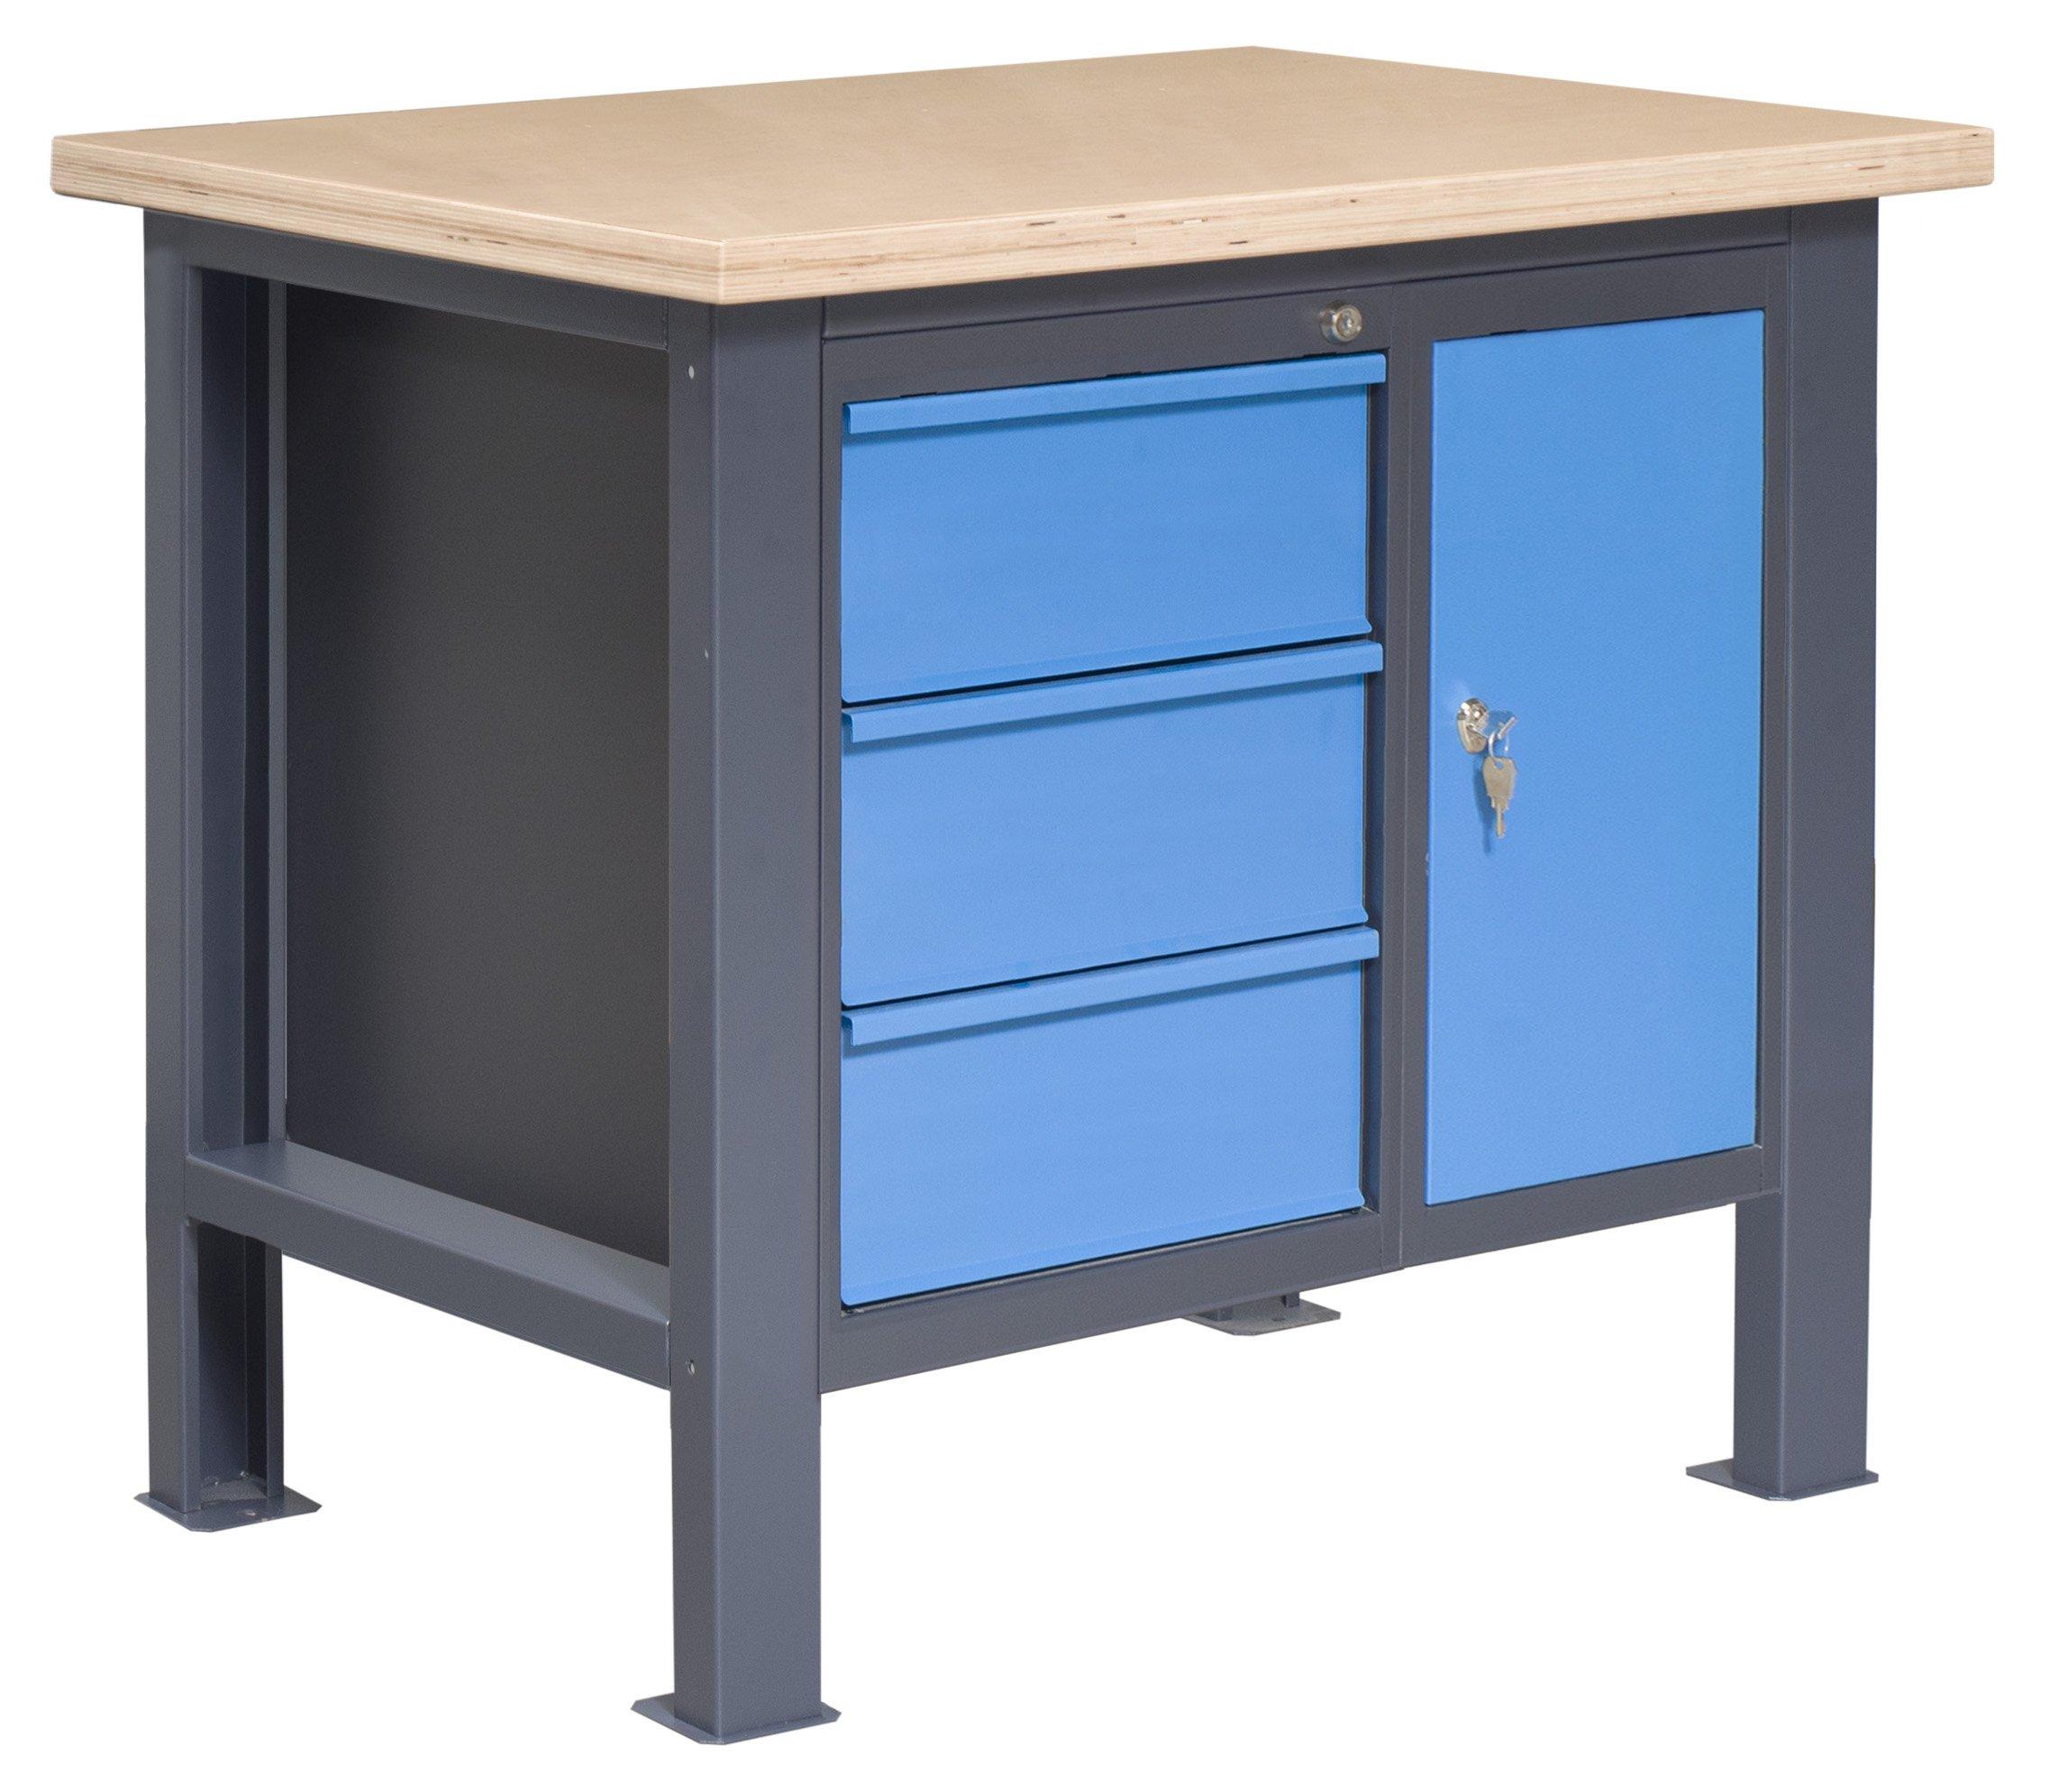 Stół warsztatowy PL01L/P8P9